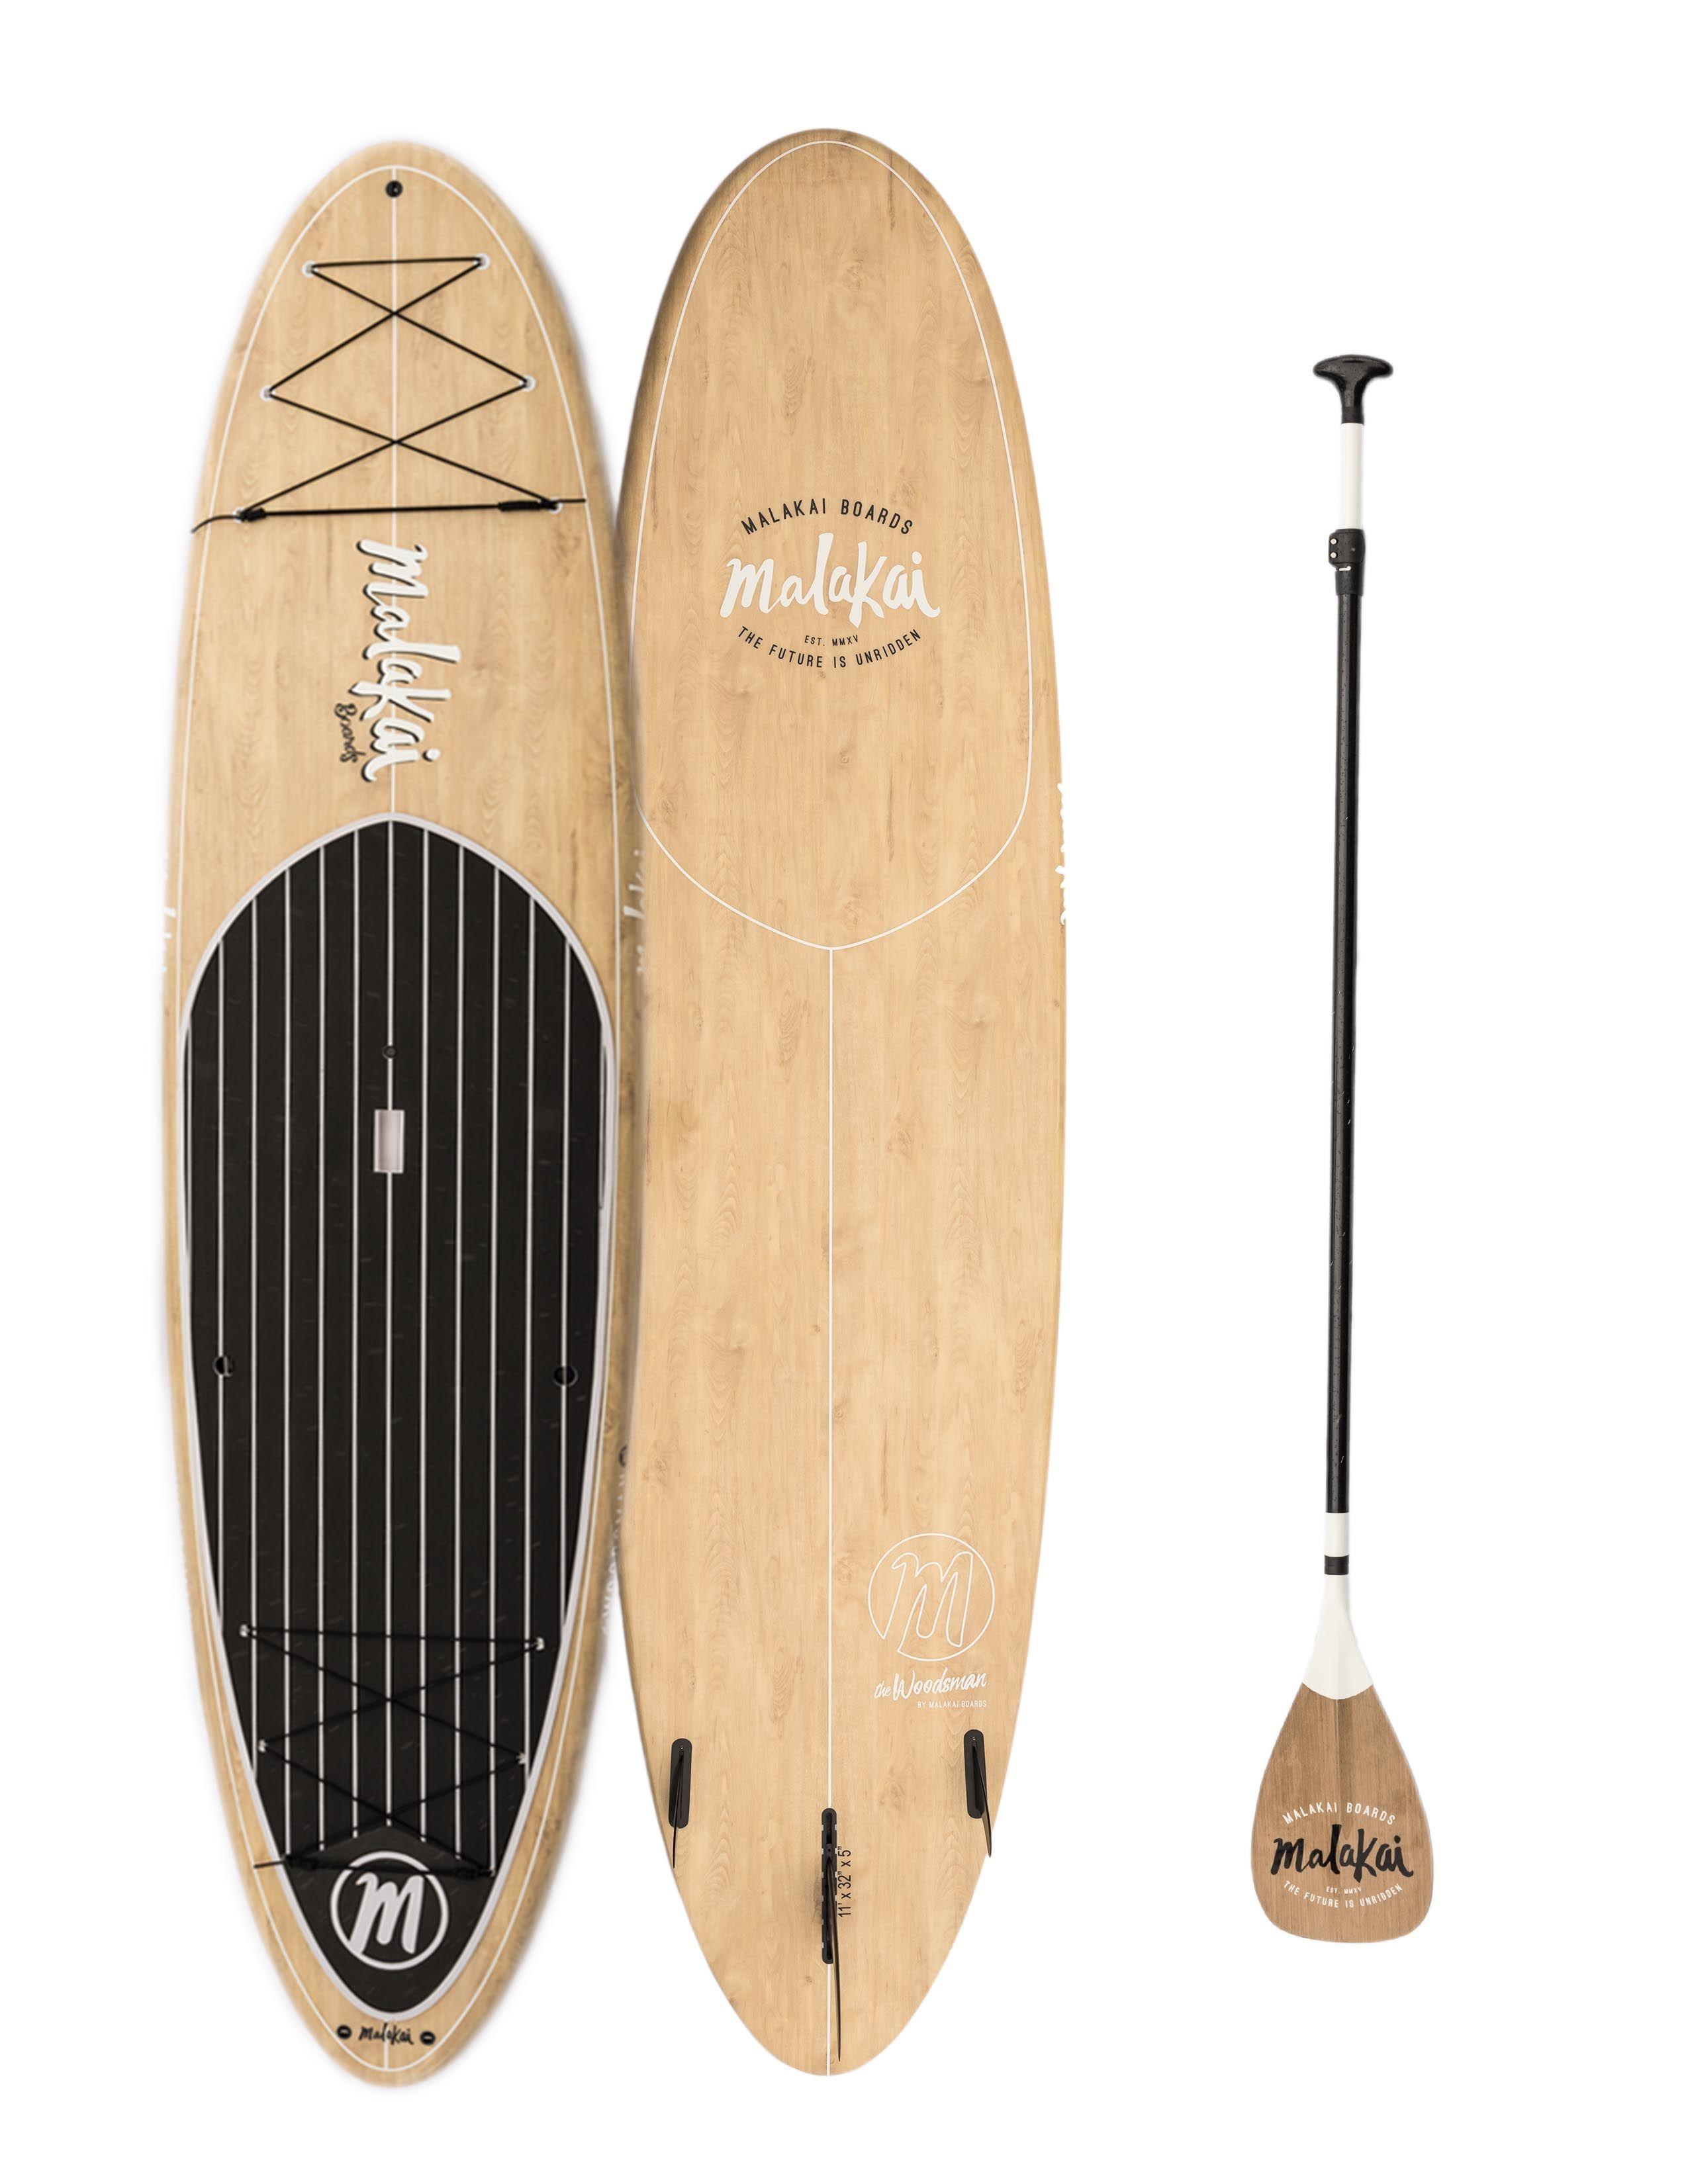 11 0 Malakai Boards The Woodsman Epoxy Sup Stand Up Paddle Board Carbon Fiber Paddle Www Malakaiboards Com Paddle Boarding Standup Paddle Paddle